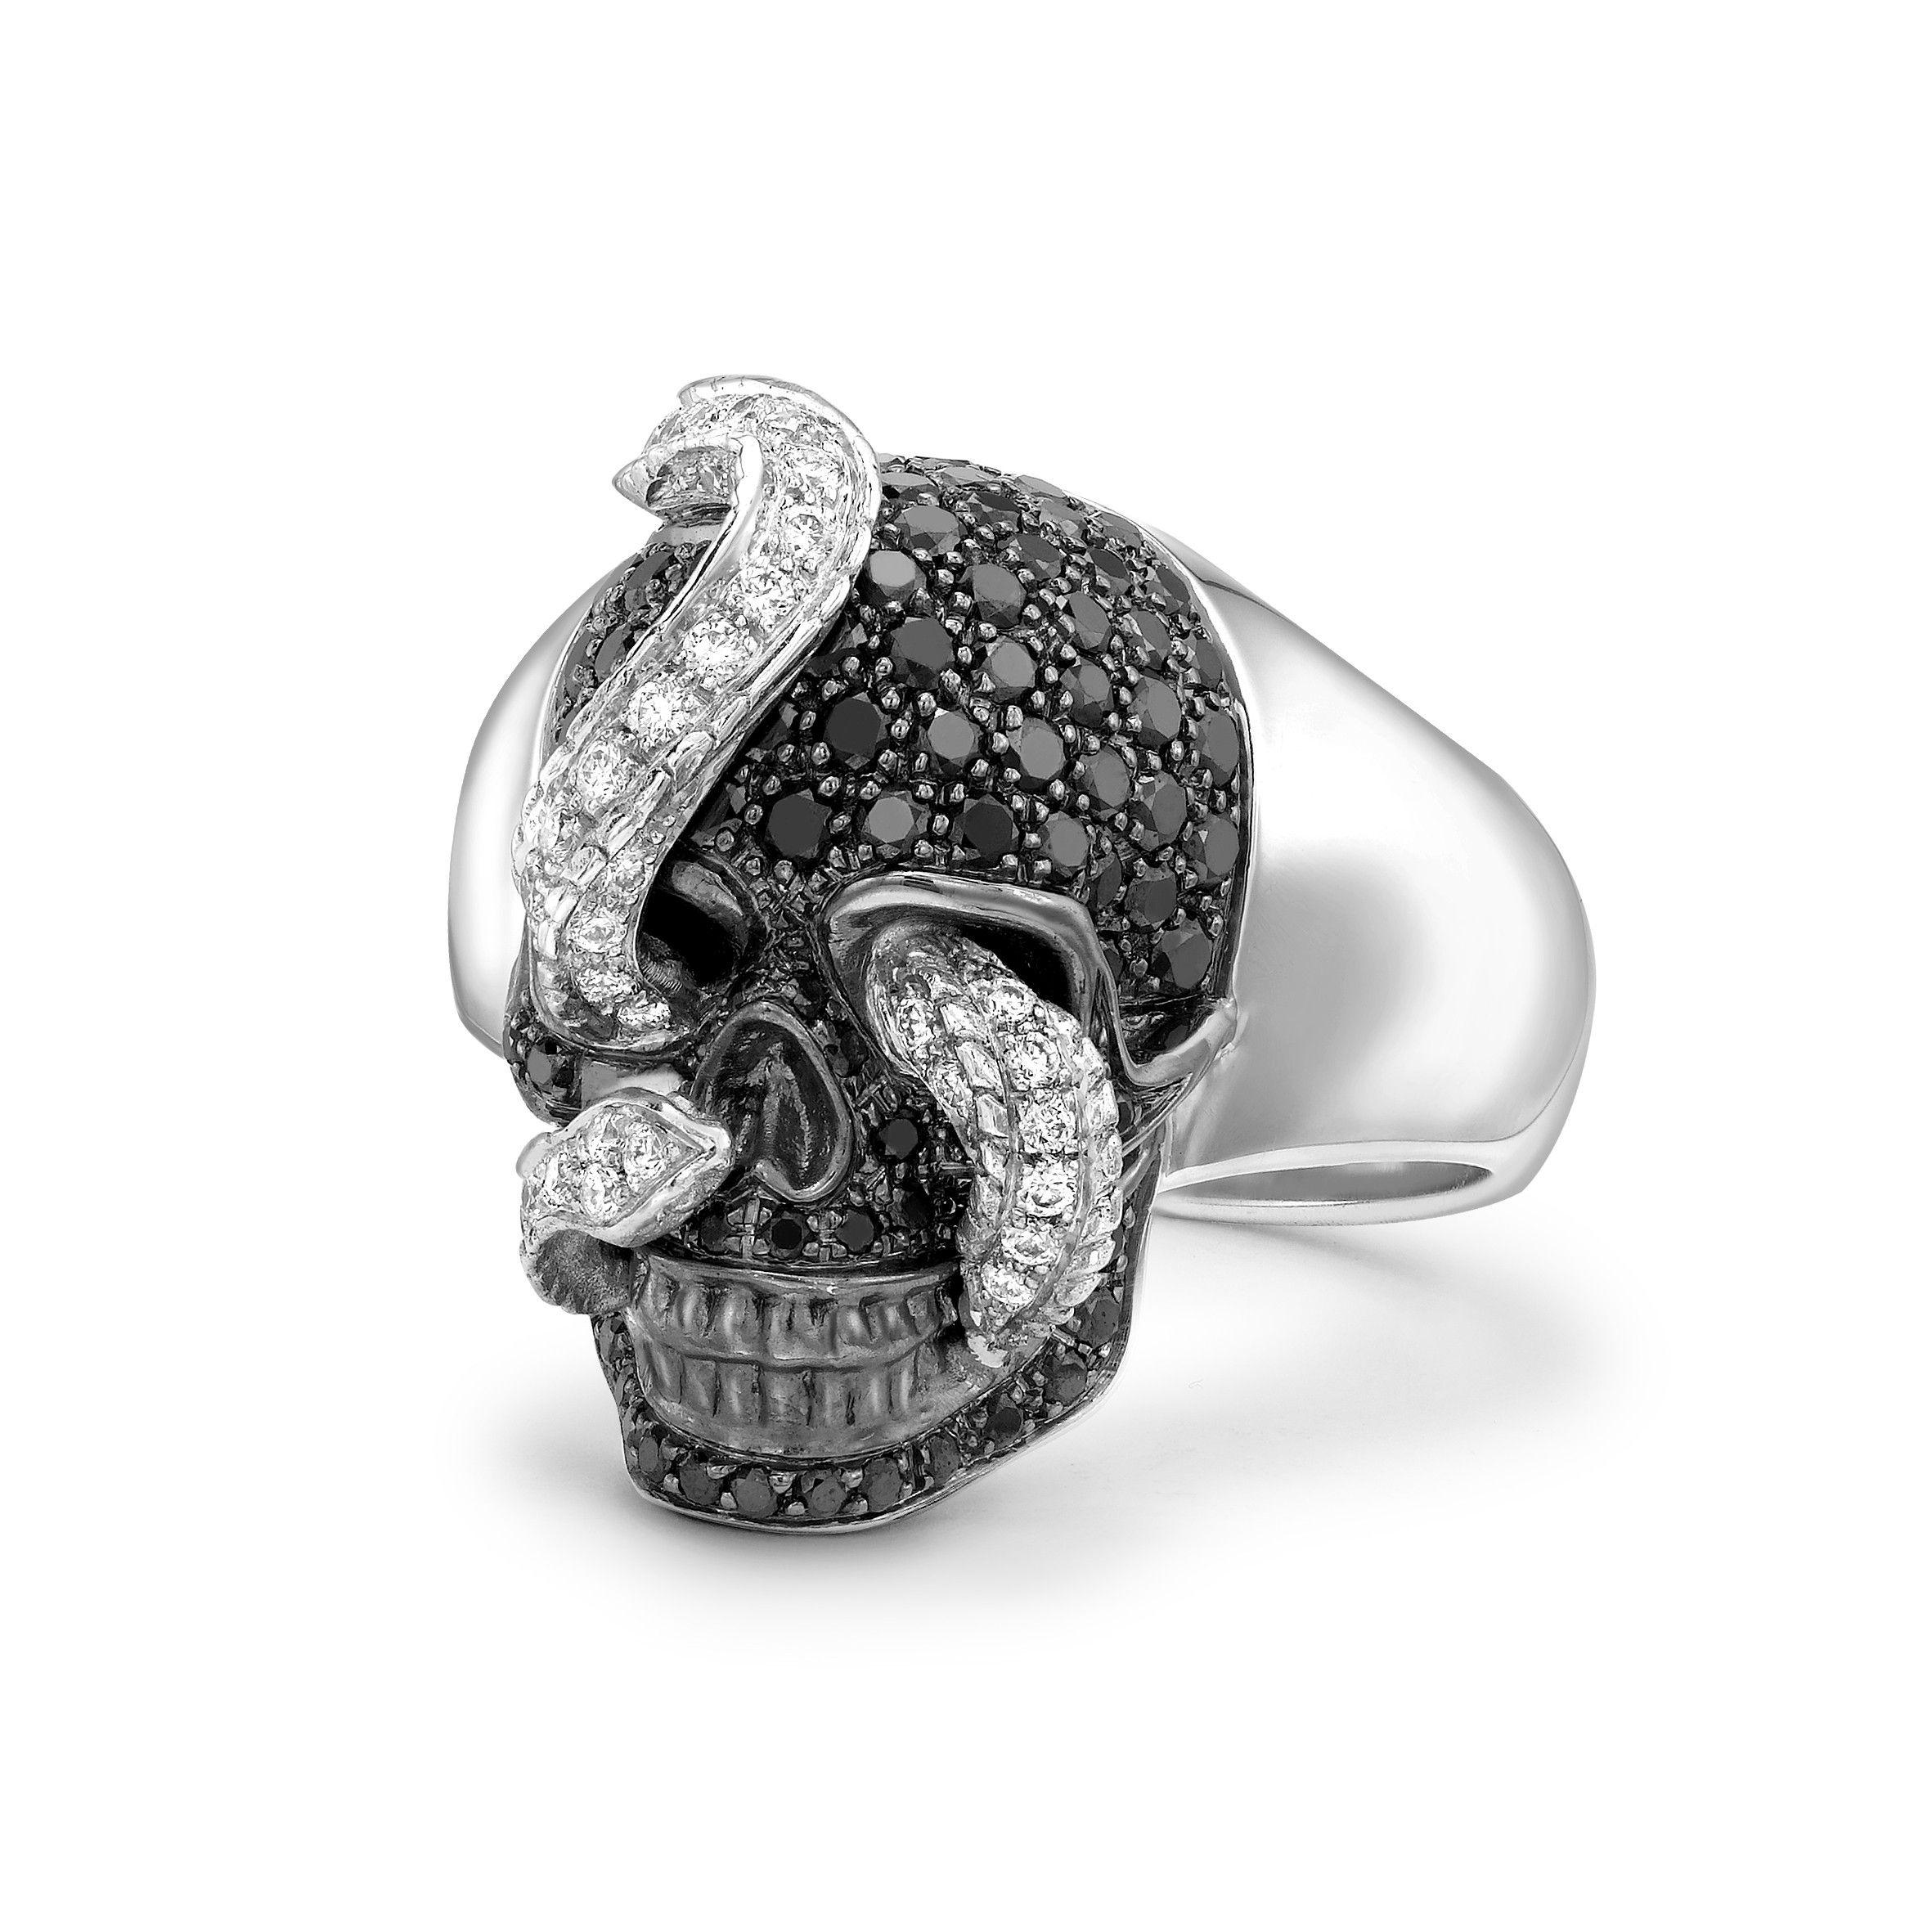 BLACK DIAMOND & DIAMOND MEDIUM SKULL AND SNAKE RING